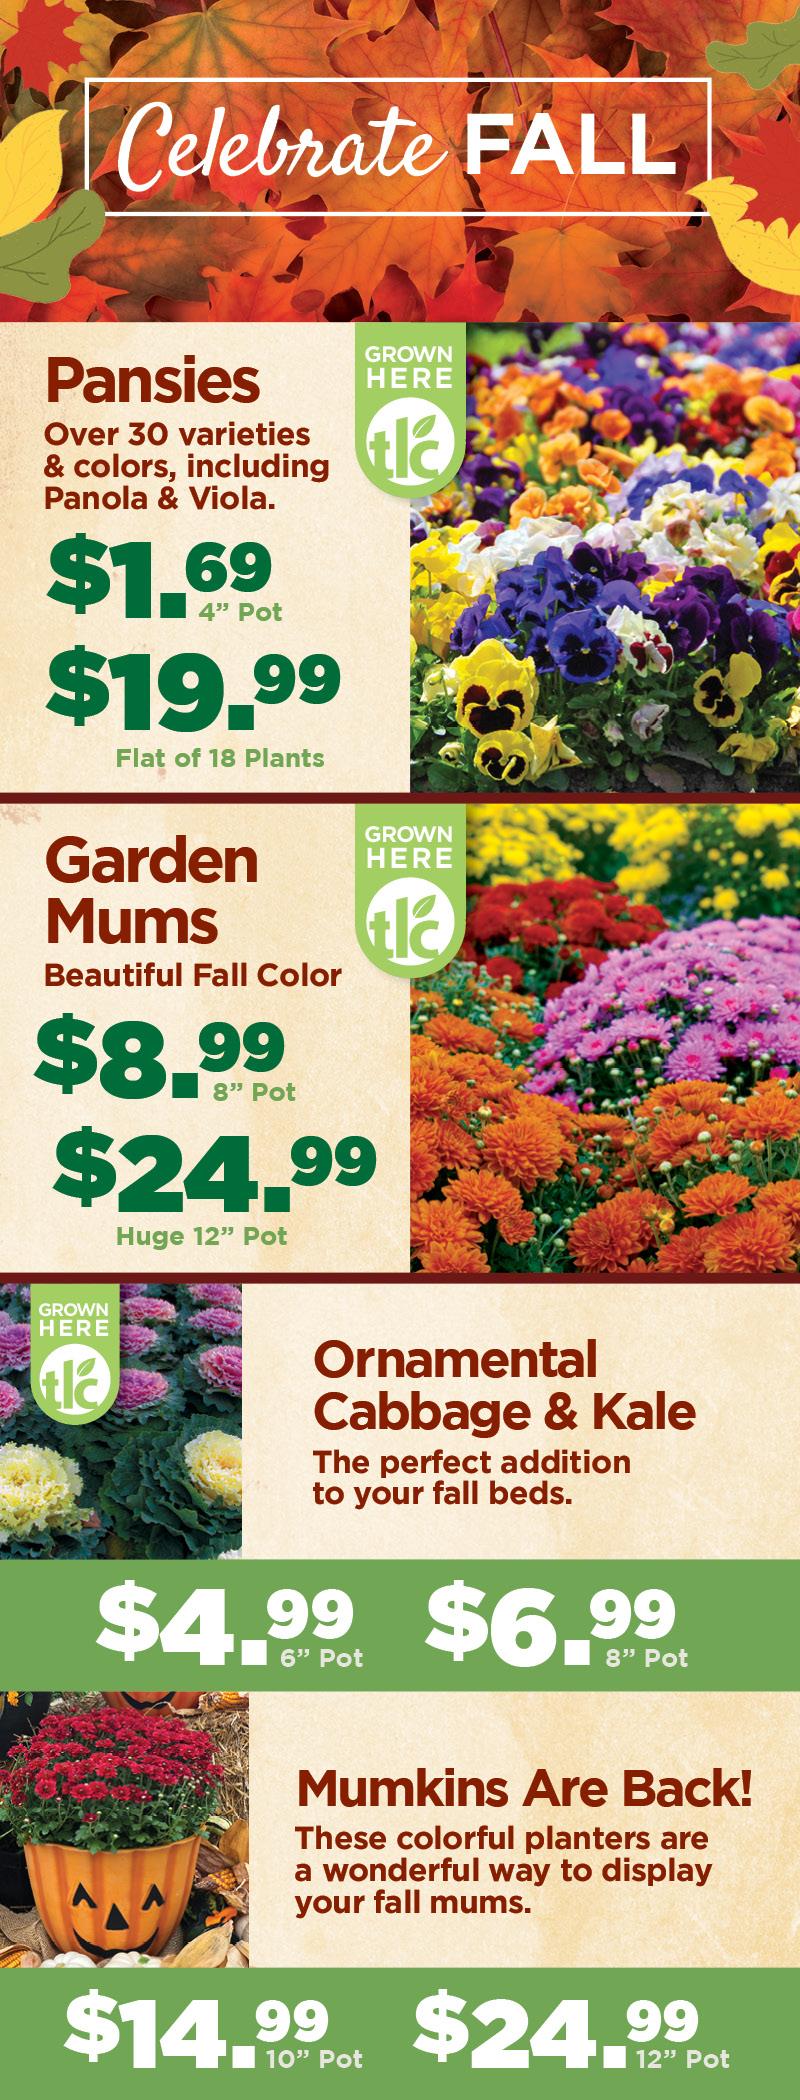 Celebrate Fall | TLC Garden Centers